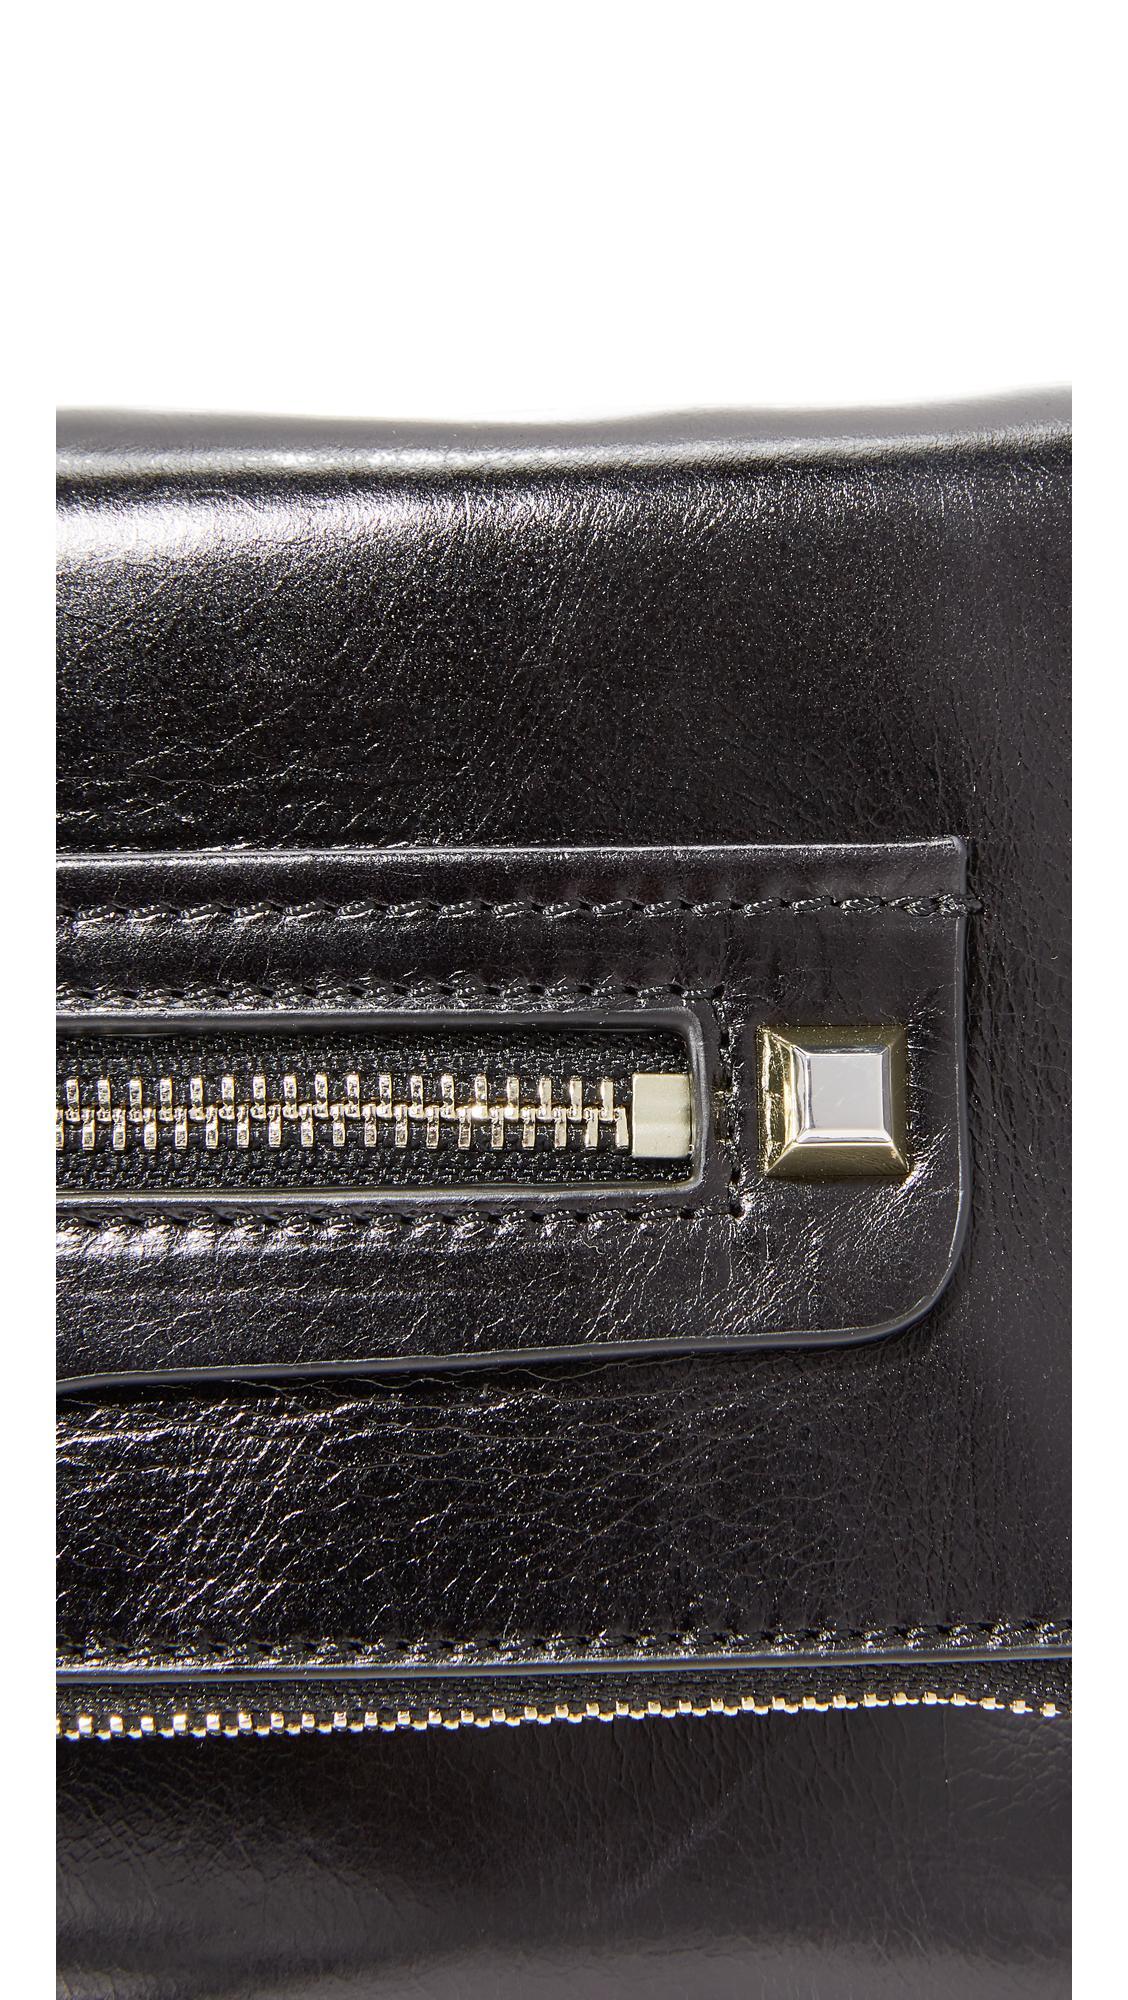 Rebecca Minkoff Leather Small Regan Cross Body Clutch in Black